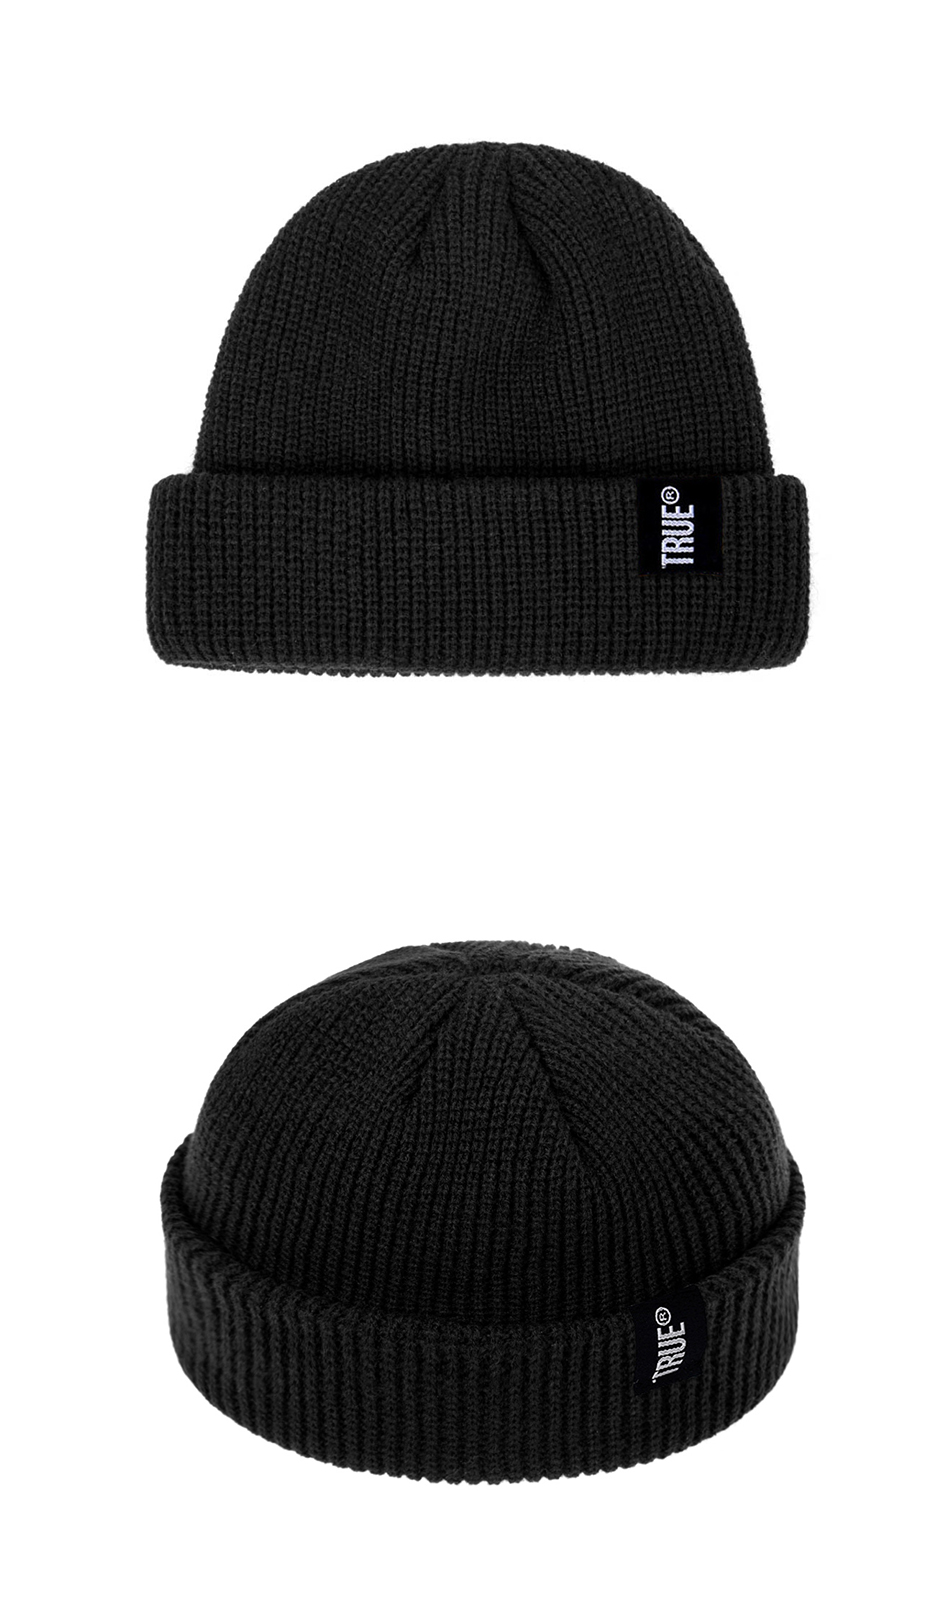 2019 Fashion Unisex Winter Hat Men Cuffed Cib Knit Hat Short Melon Ski Beanies Autumn Winter Solid Color Casual Beanie Hat 38